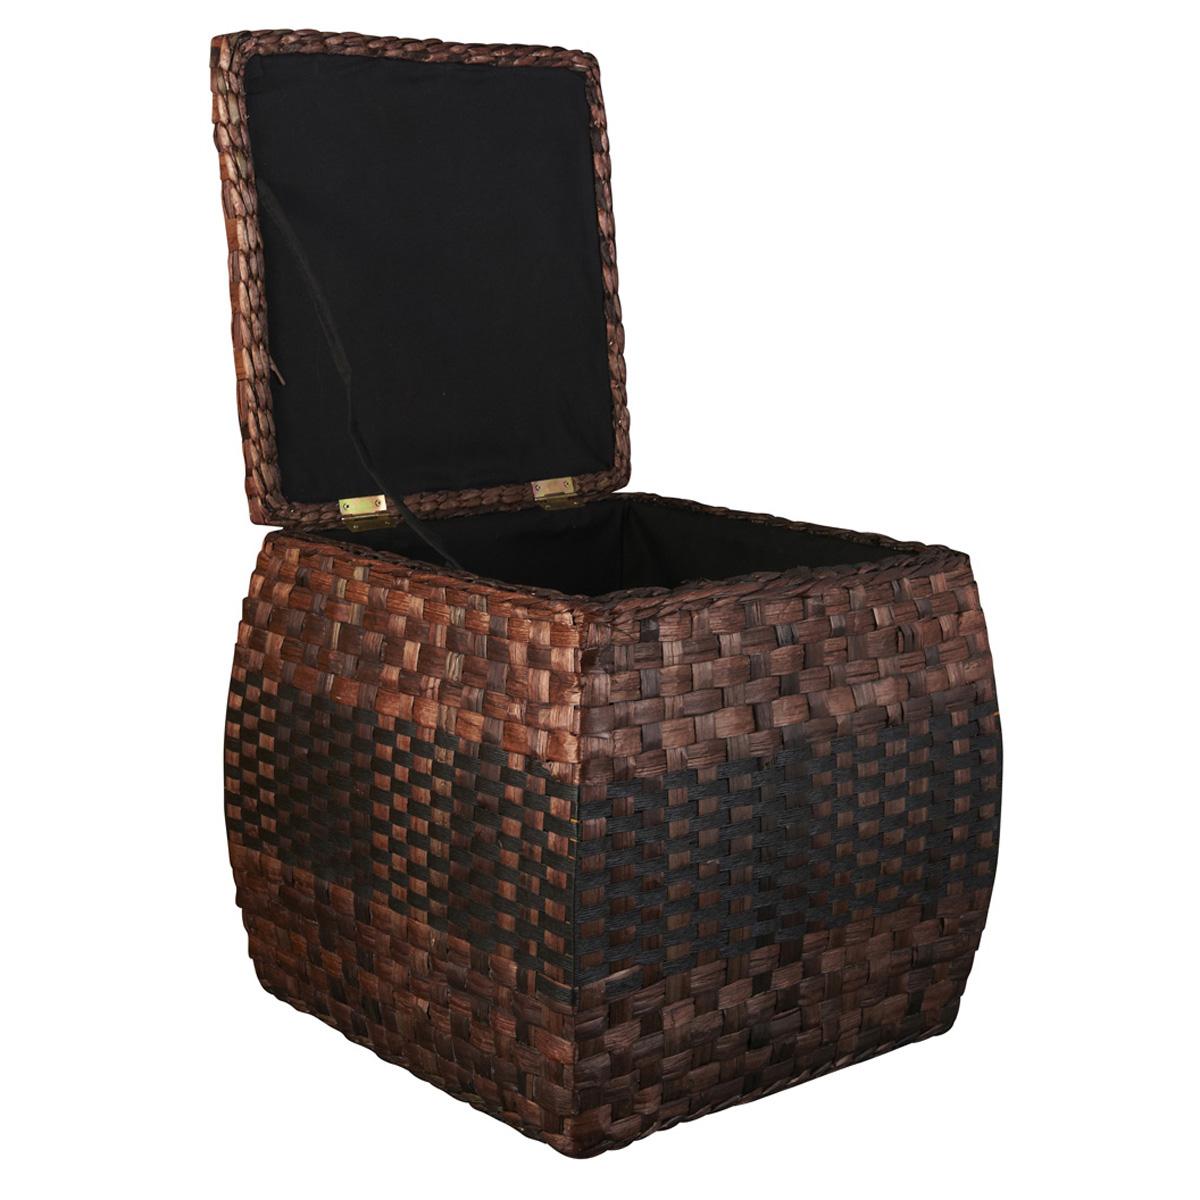 Ashland Rush Ottoman With Hinged Lid Storage Basket